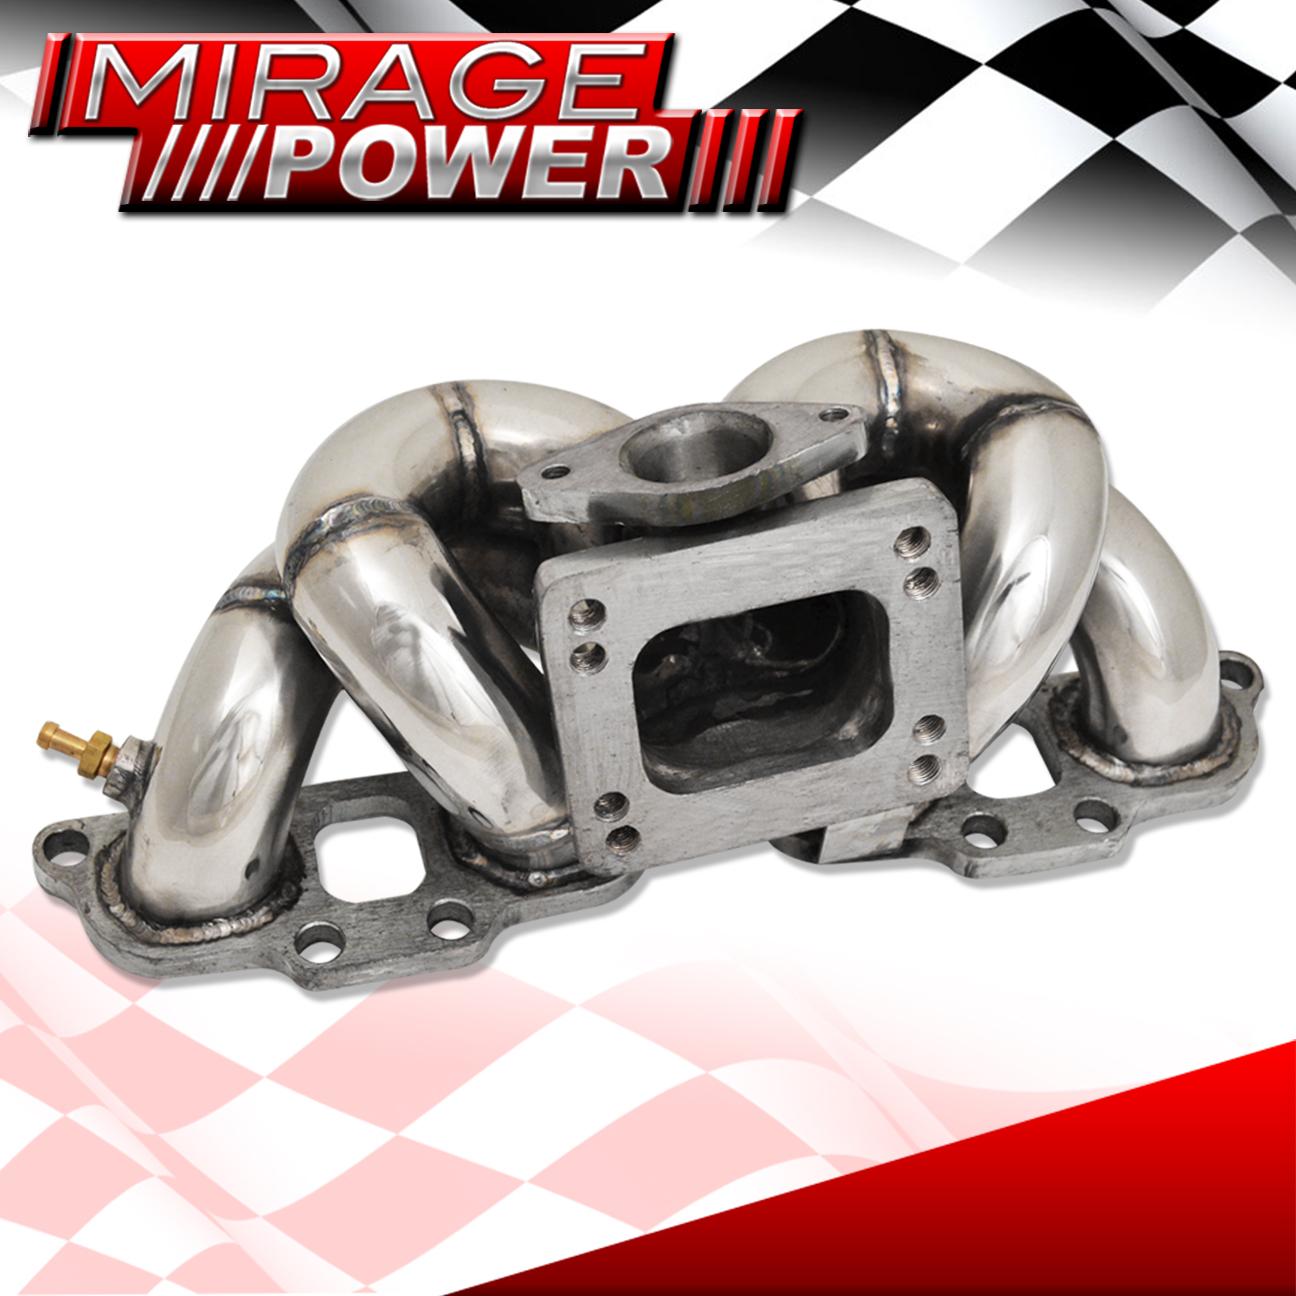 Sr20det Turbo: For 89-98 240SX S13 S14 SR20 SR20DET Motor T3T4 T3 T4